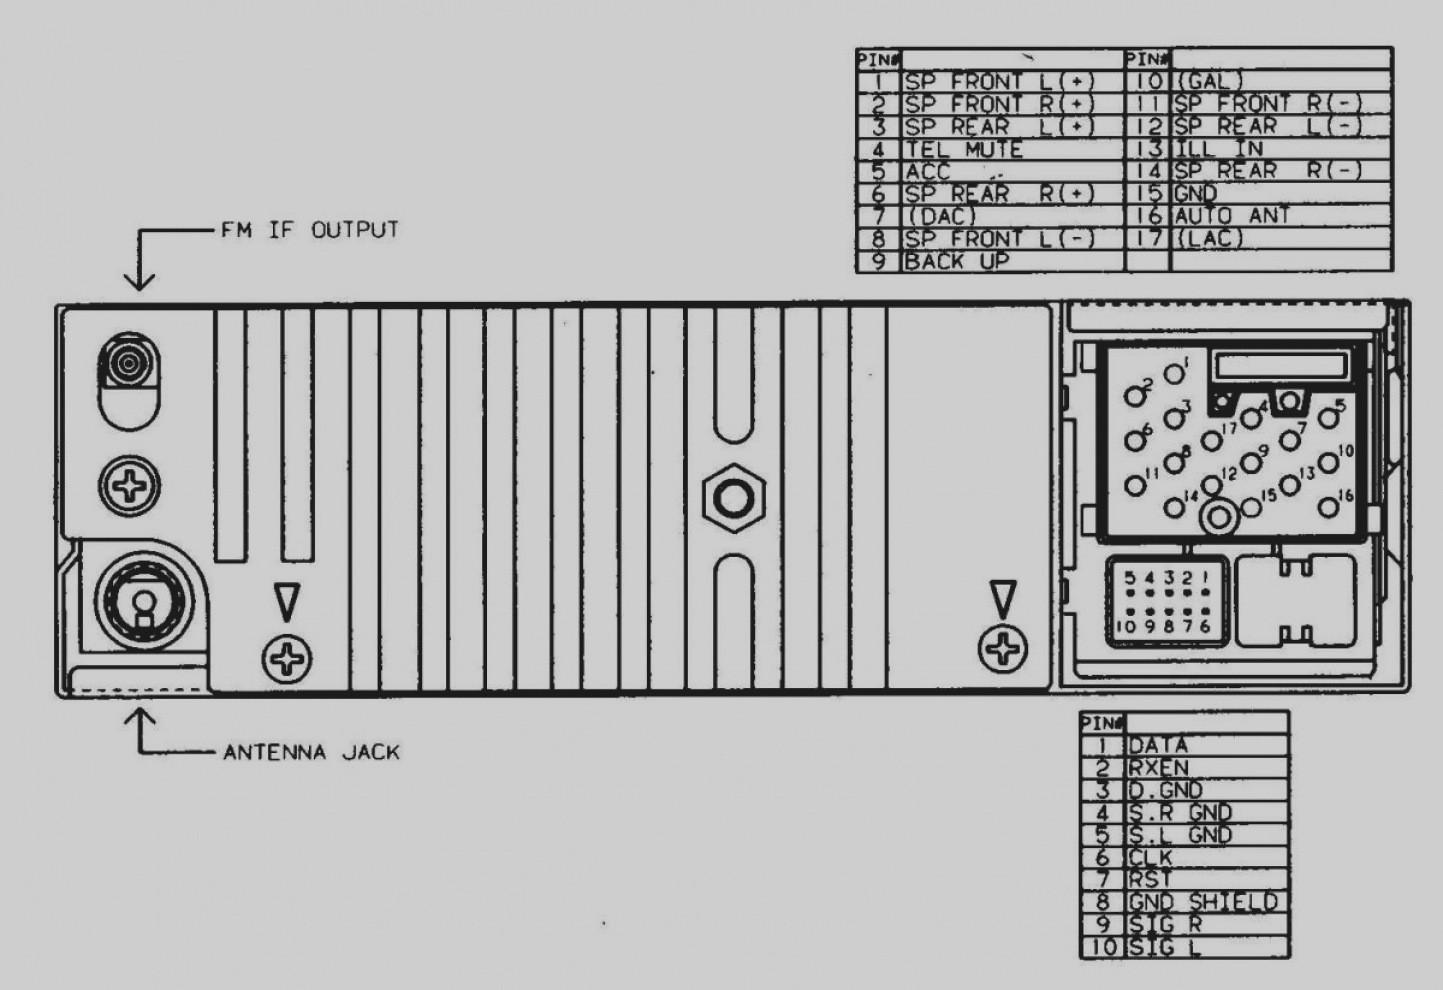 bmw x5 e53 wiring diagram york air handler e46 engine library